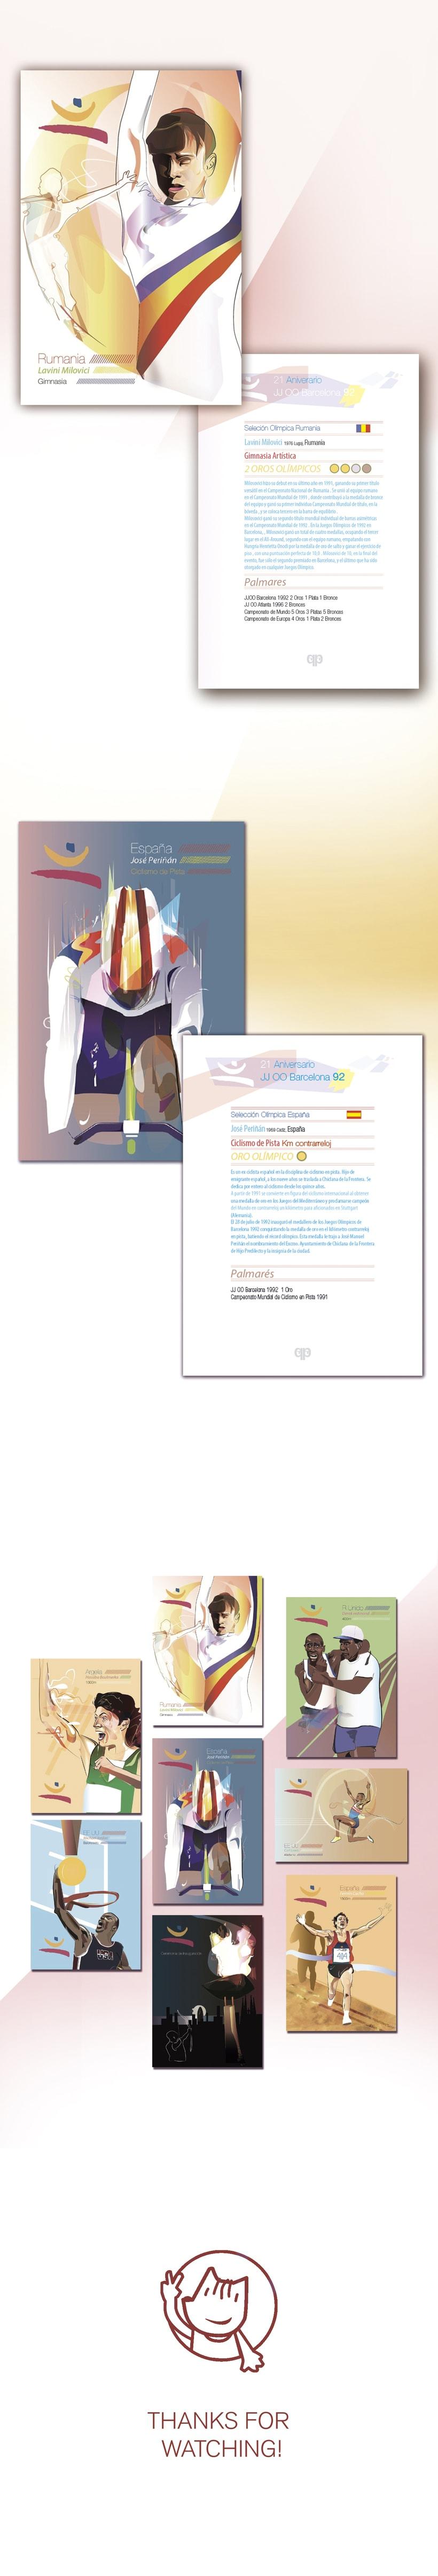 Postales Ilustradas - 20 aniversario de los JJOO Barcelona 92 2